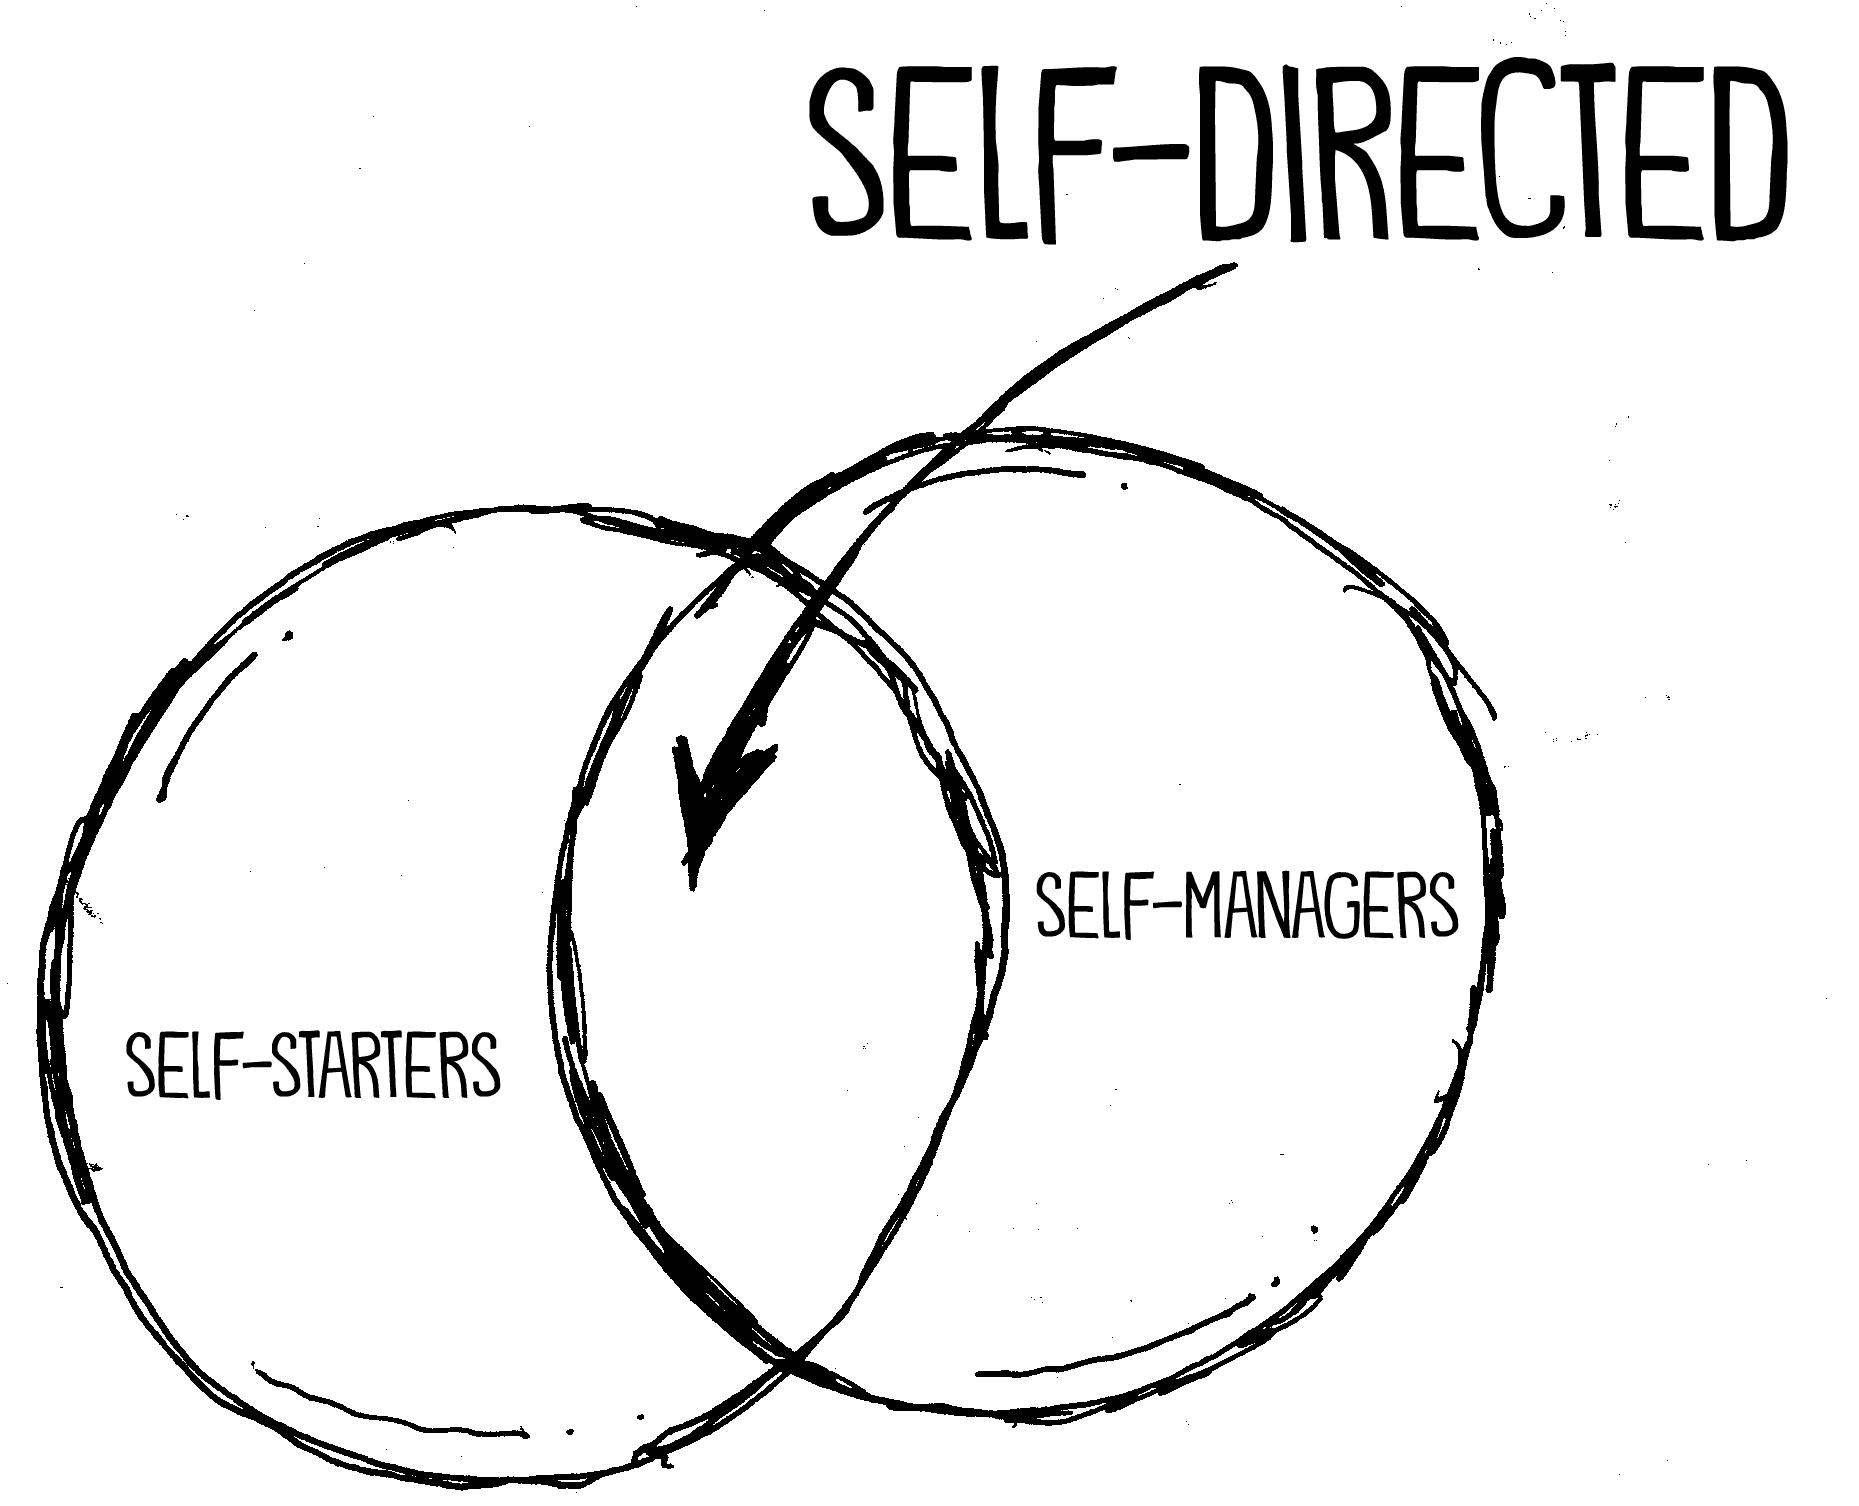 self-directed